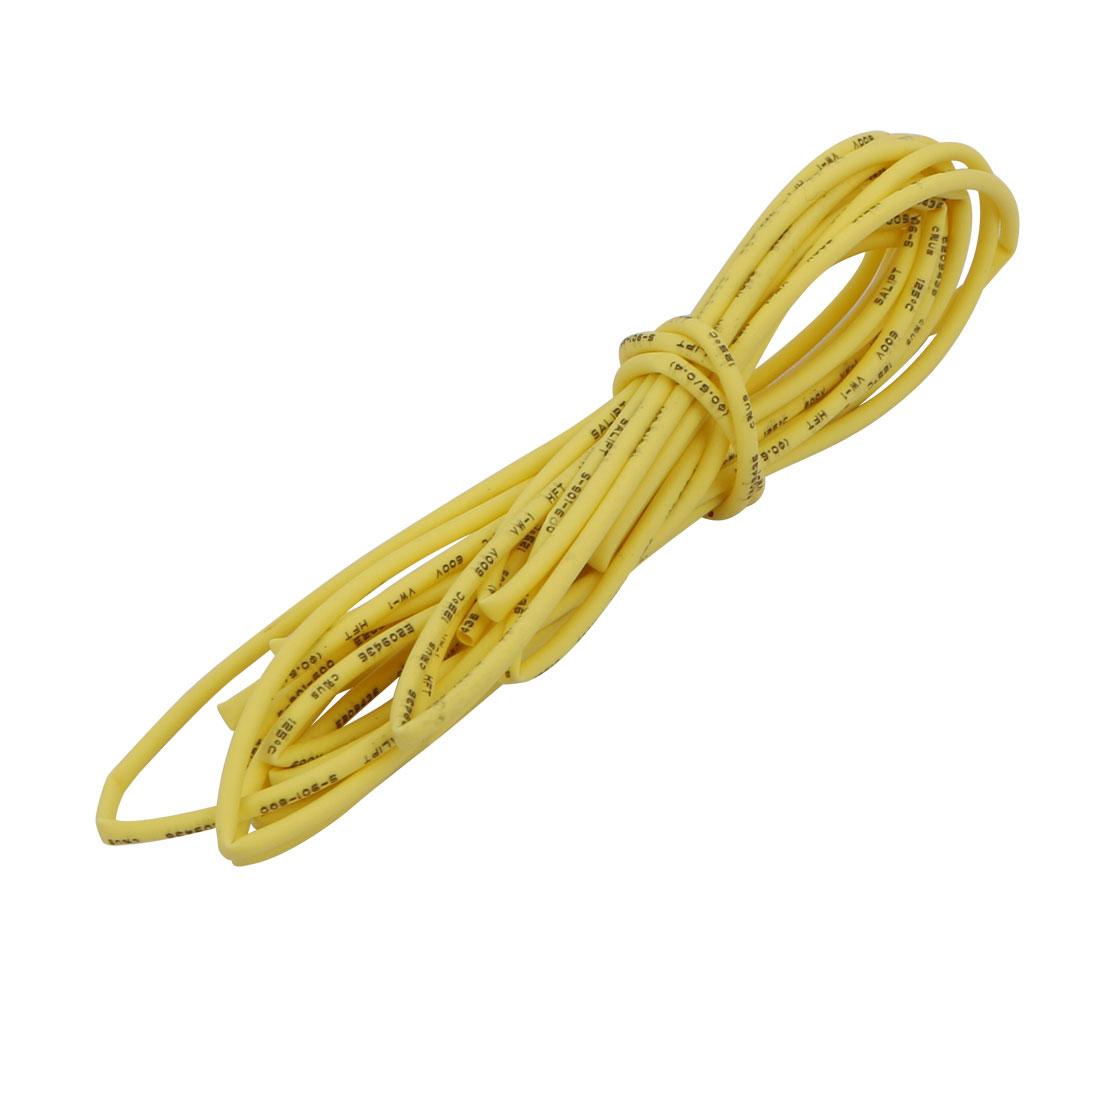 Polyolefin Heat Shrinkable Flame Retardant Tube 2M Long 0.6mm Inner Dia Yellow